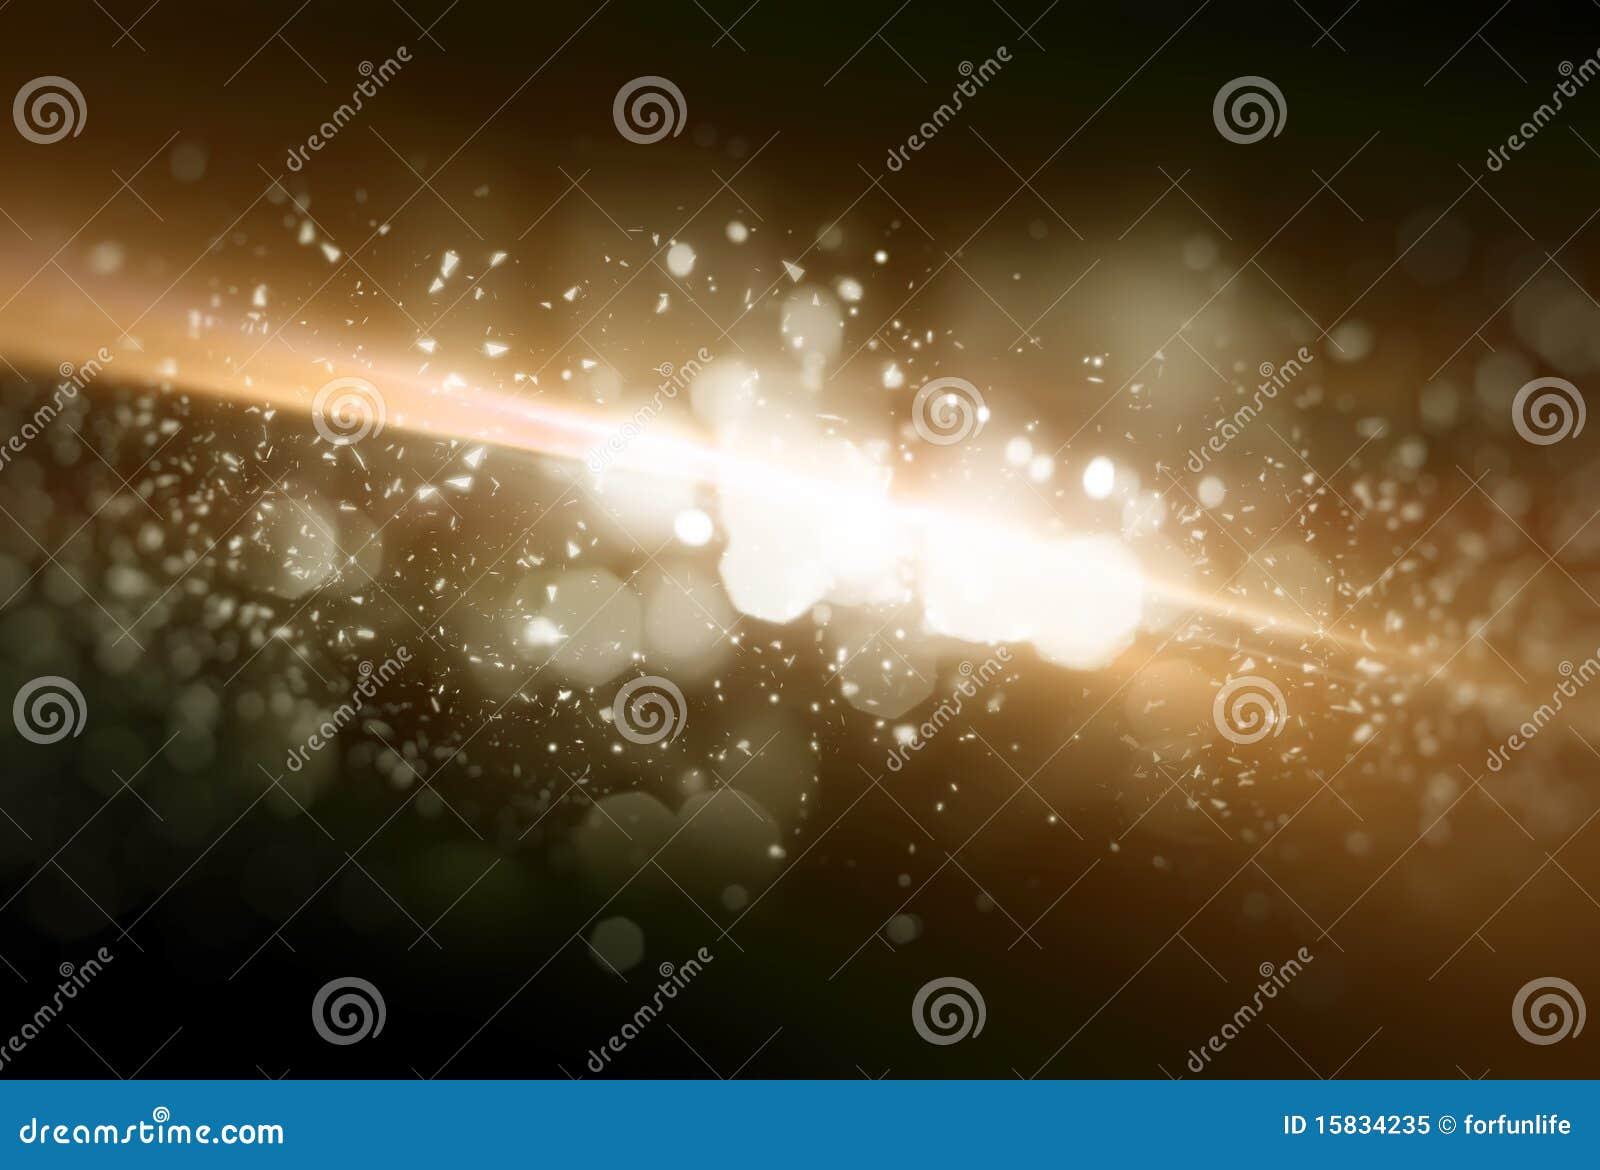 Explosion speed background